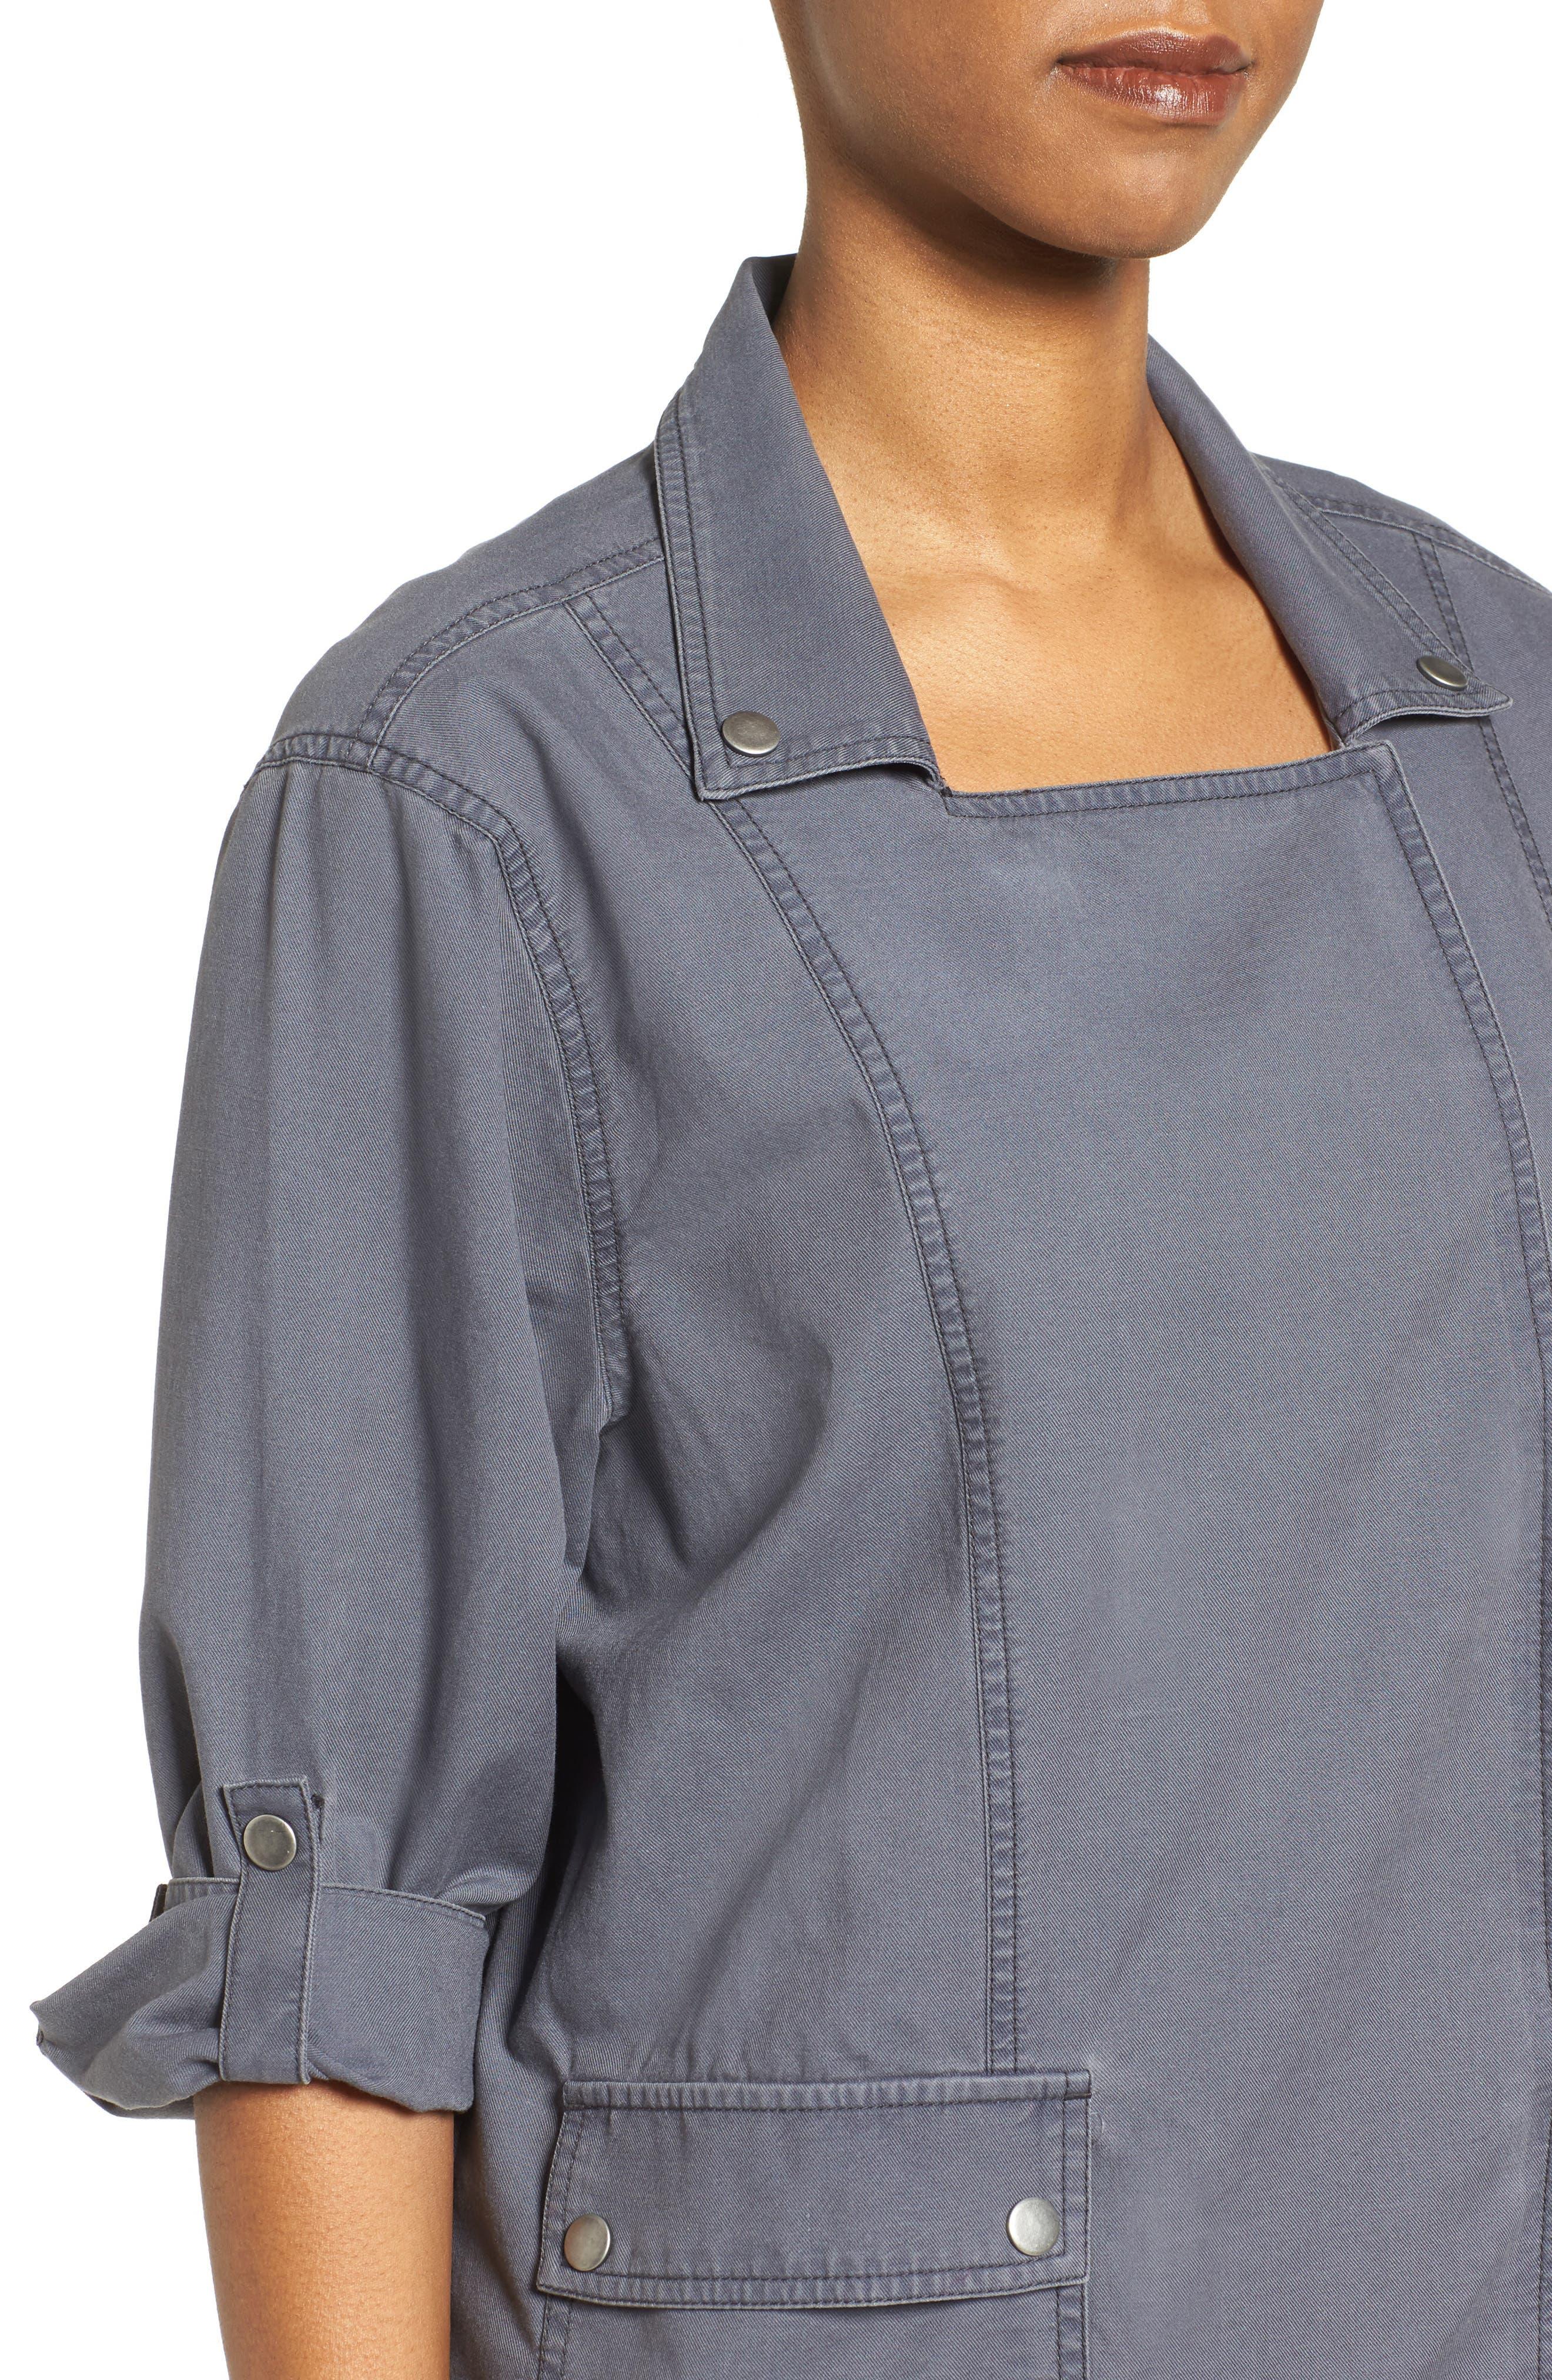 Roll Sleeve Utility Jacket,                             Alternate thumbnail 4, color,                             030